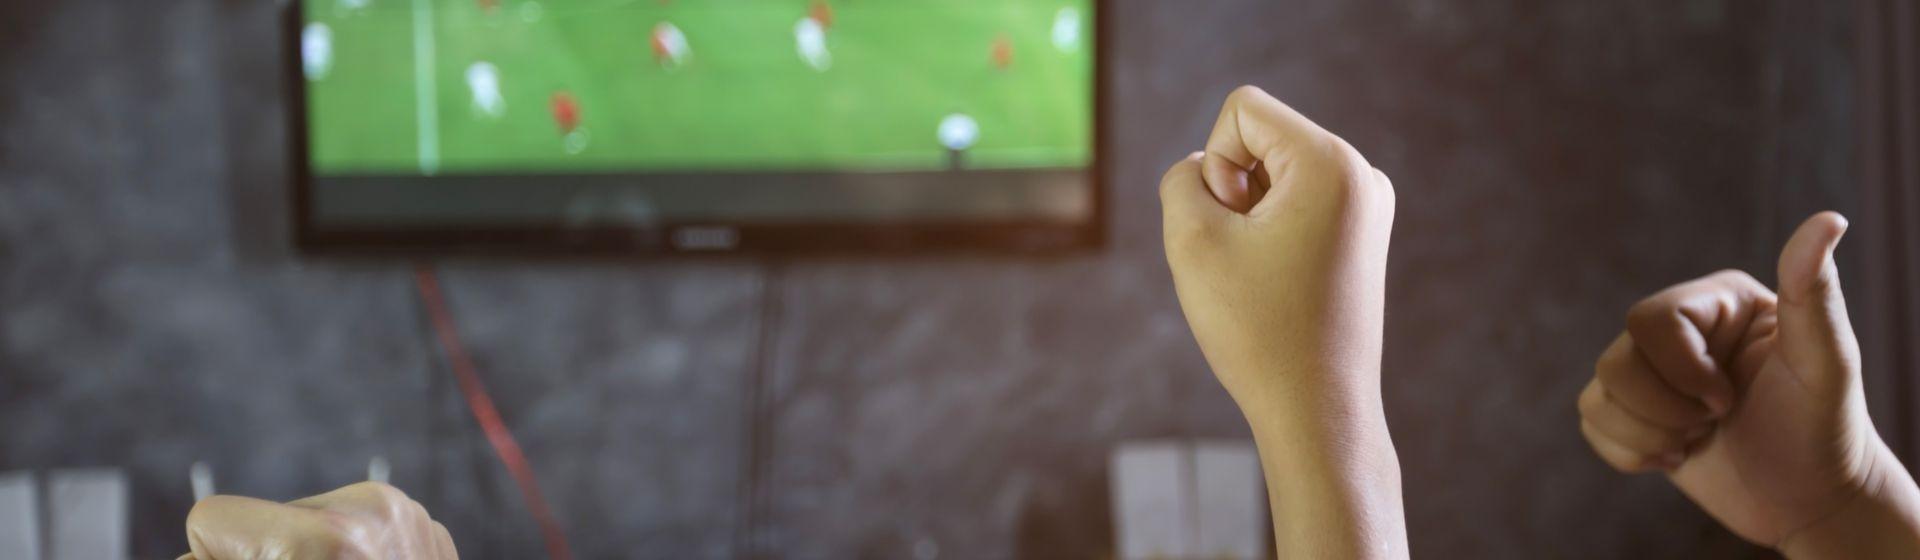 Como assistir Conmebol TV ao vivo na TV?